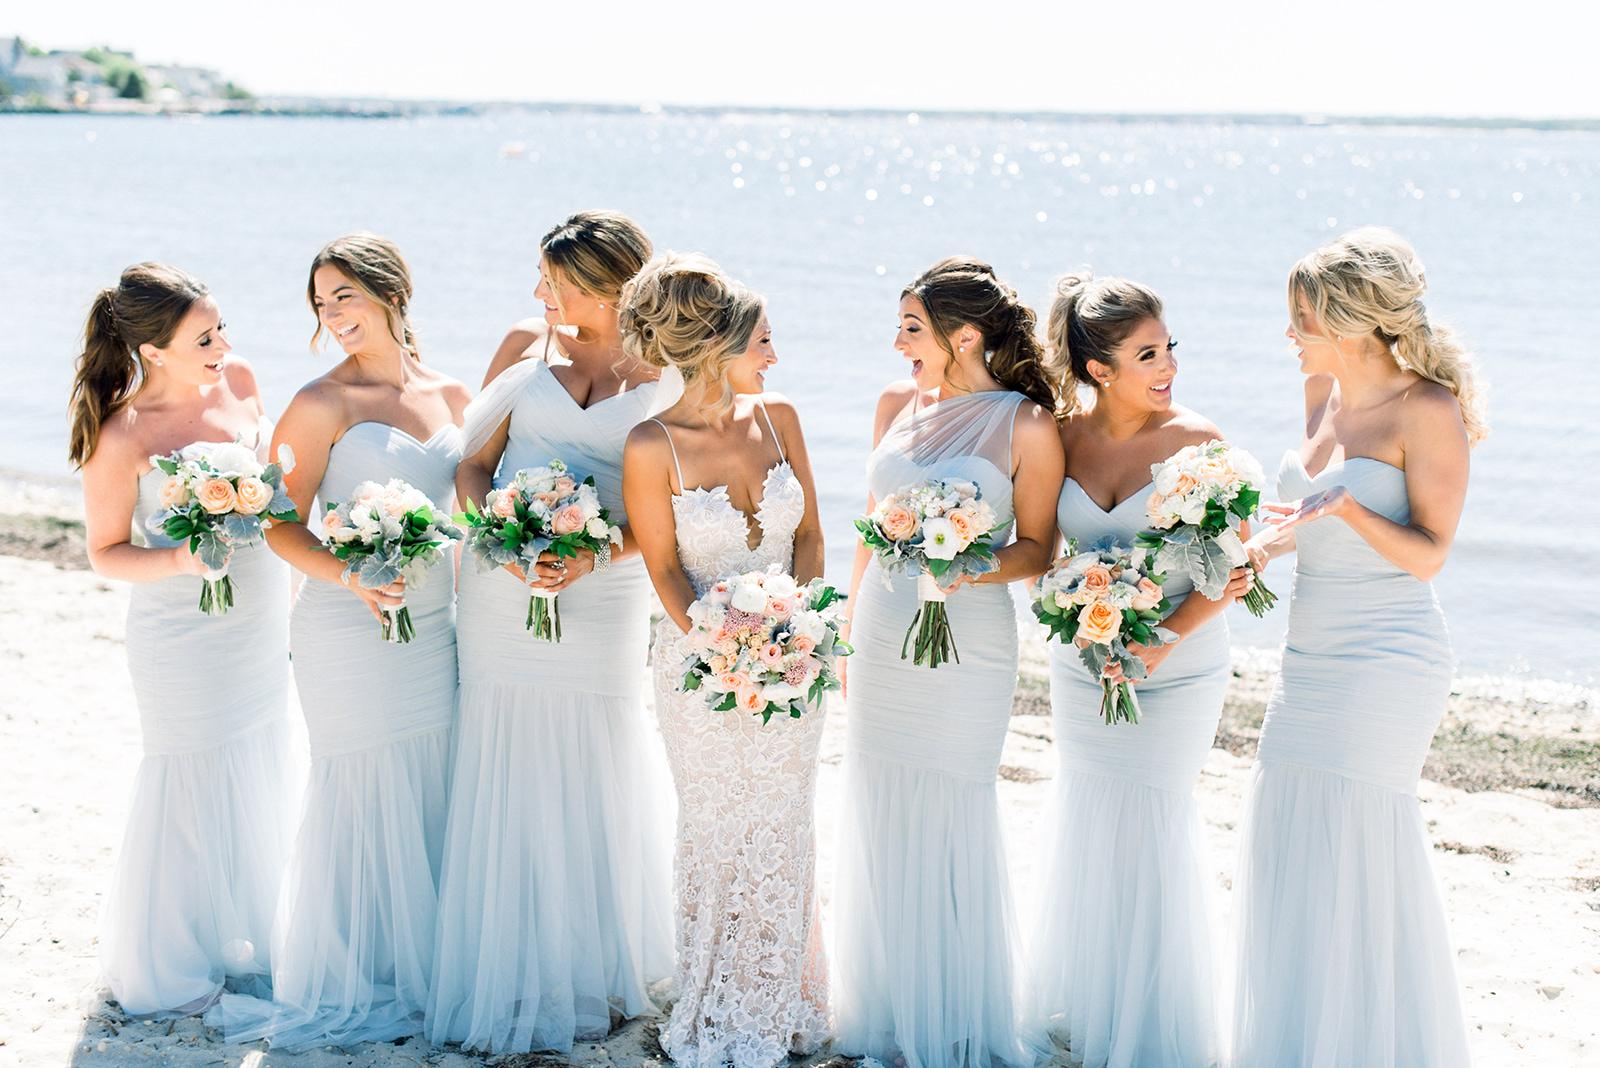 tiff bridesmaids 2.jpg